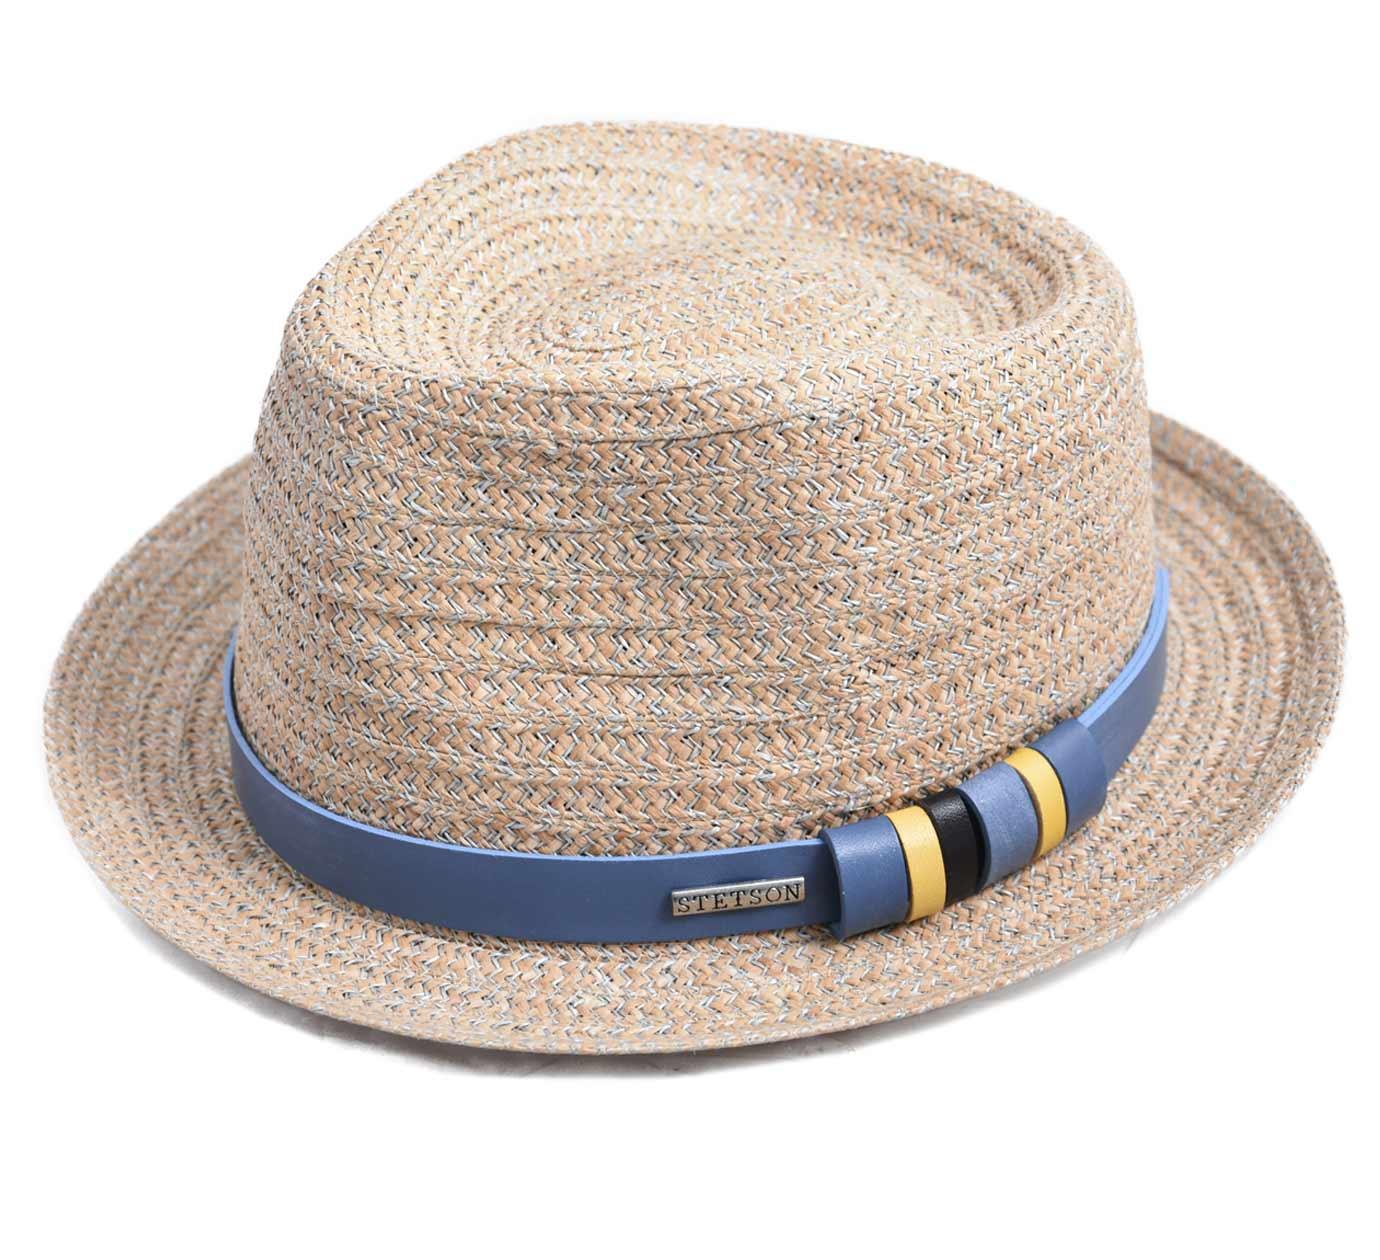 cde7eb1ce Benfield Hemp fedora - Hats Stetson